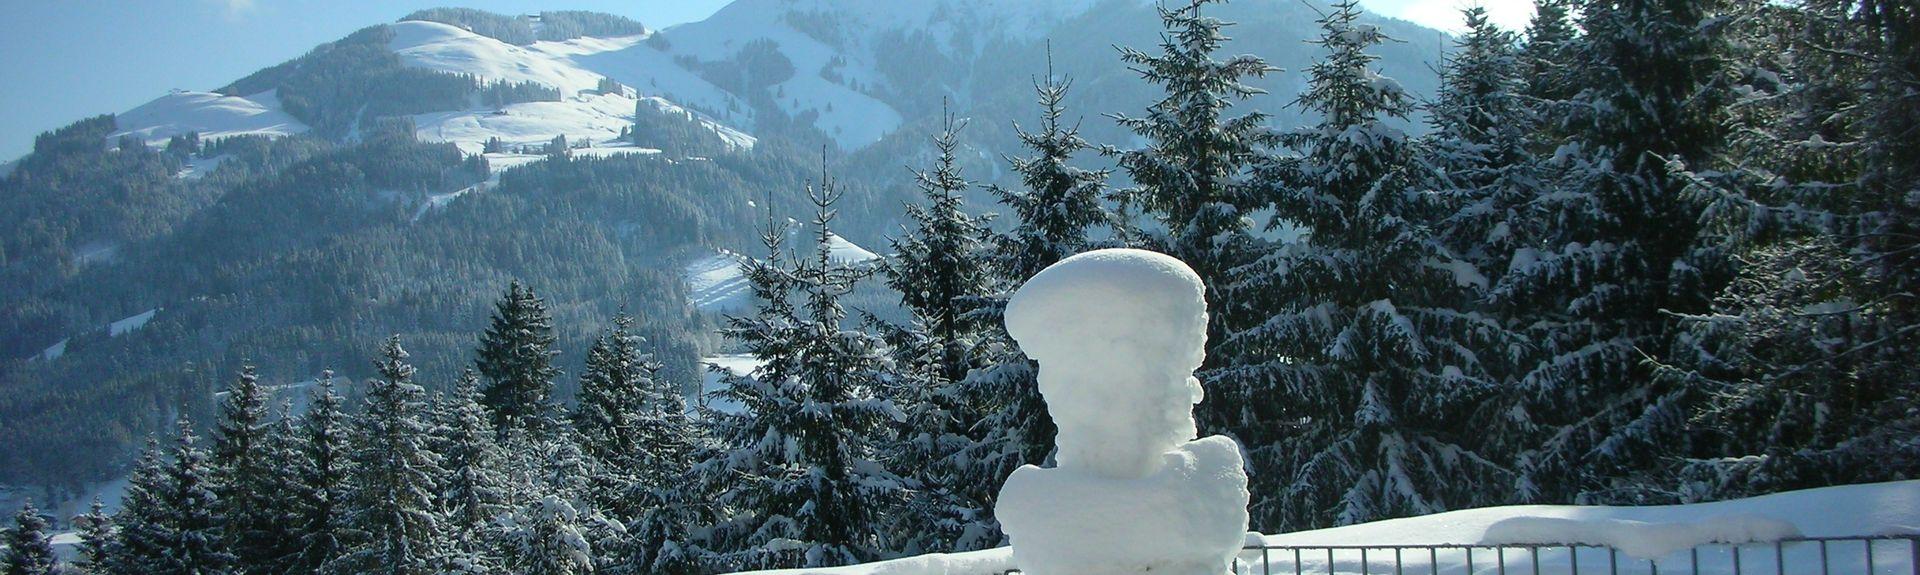 Pinzgauer Saalachtal, Austria